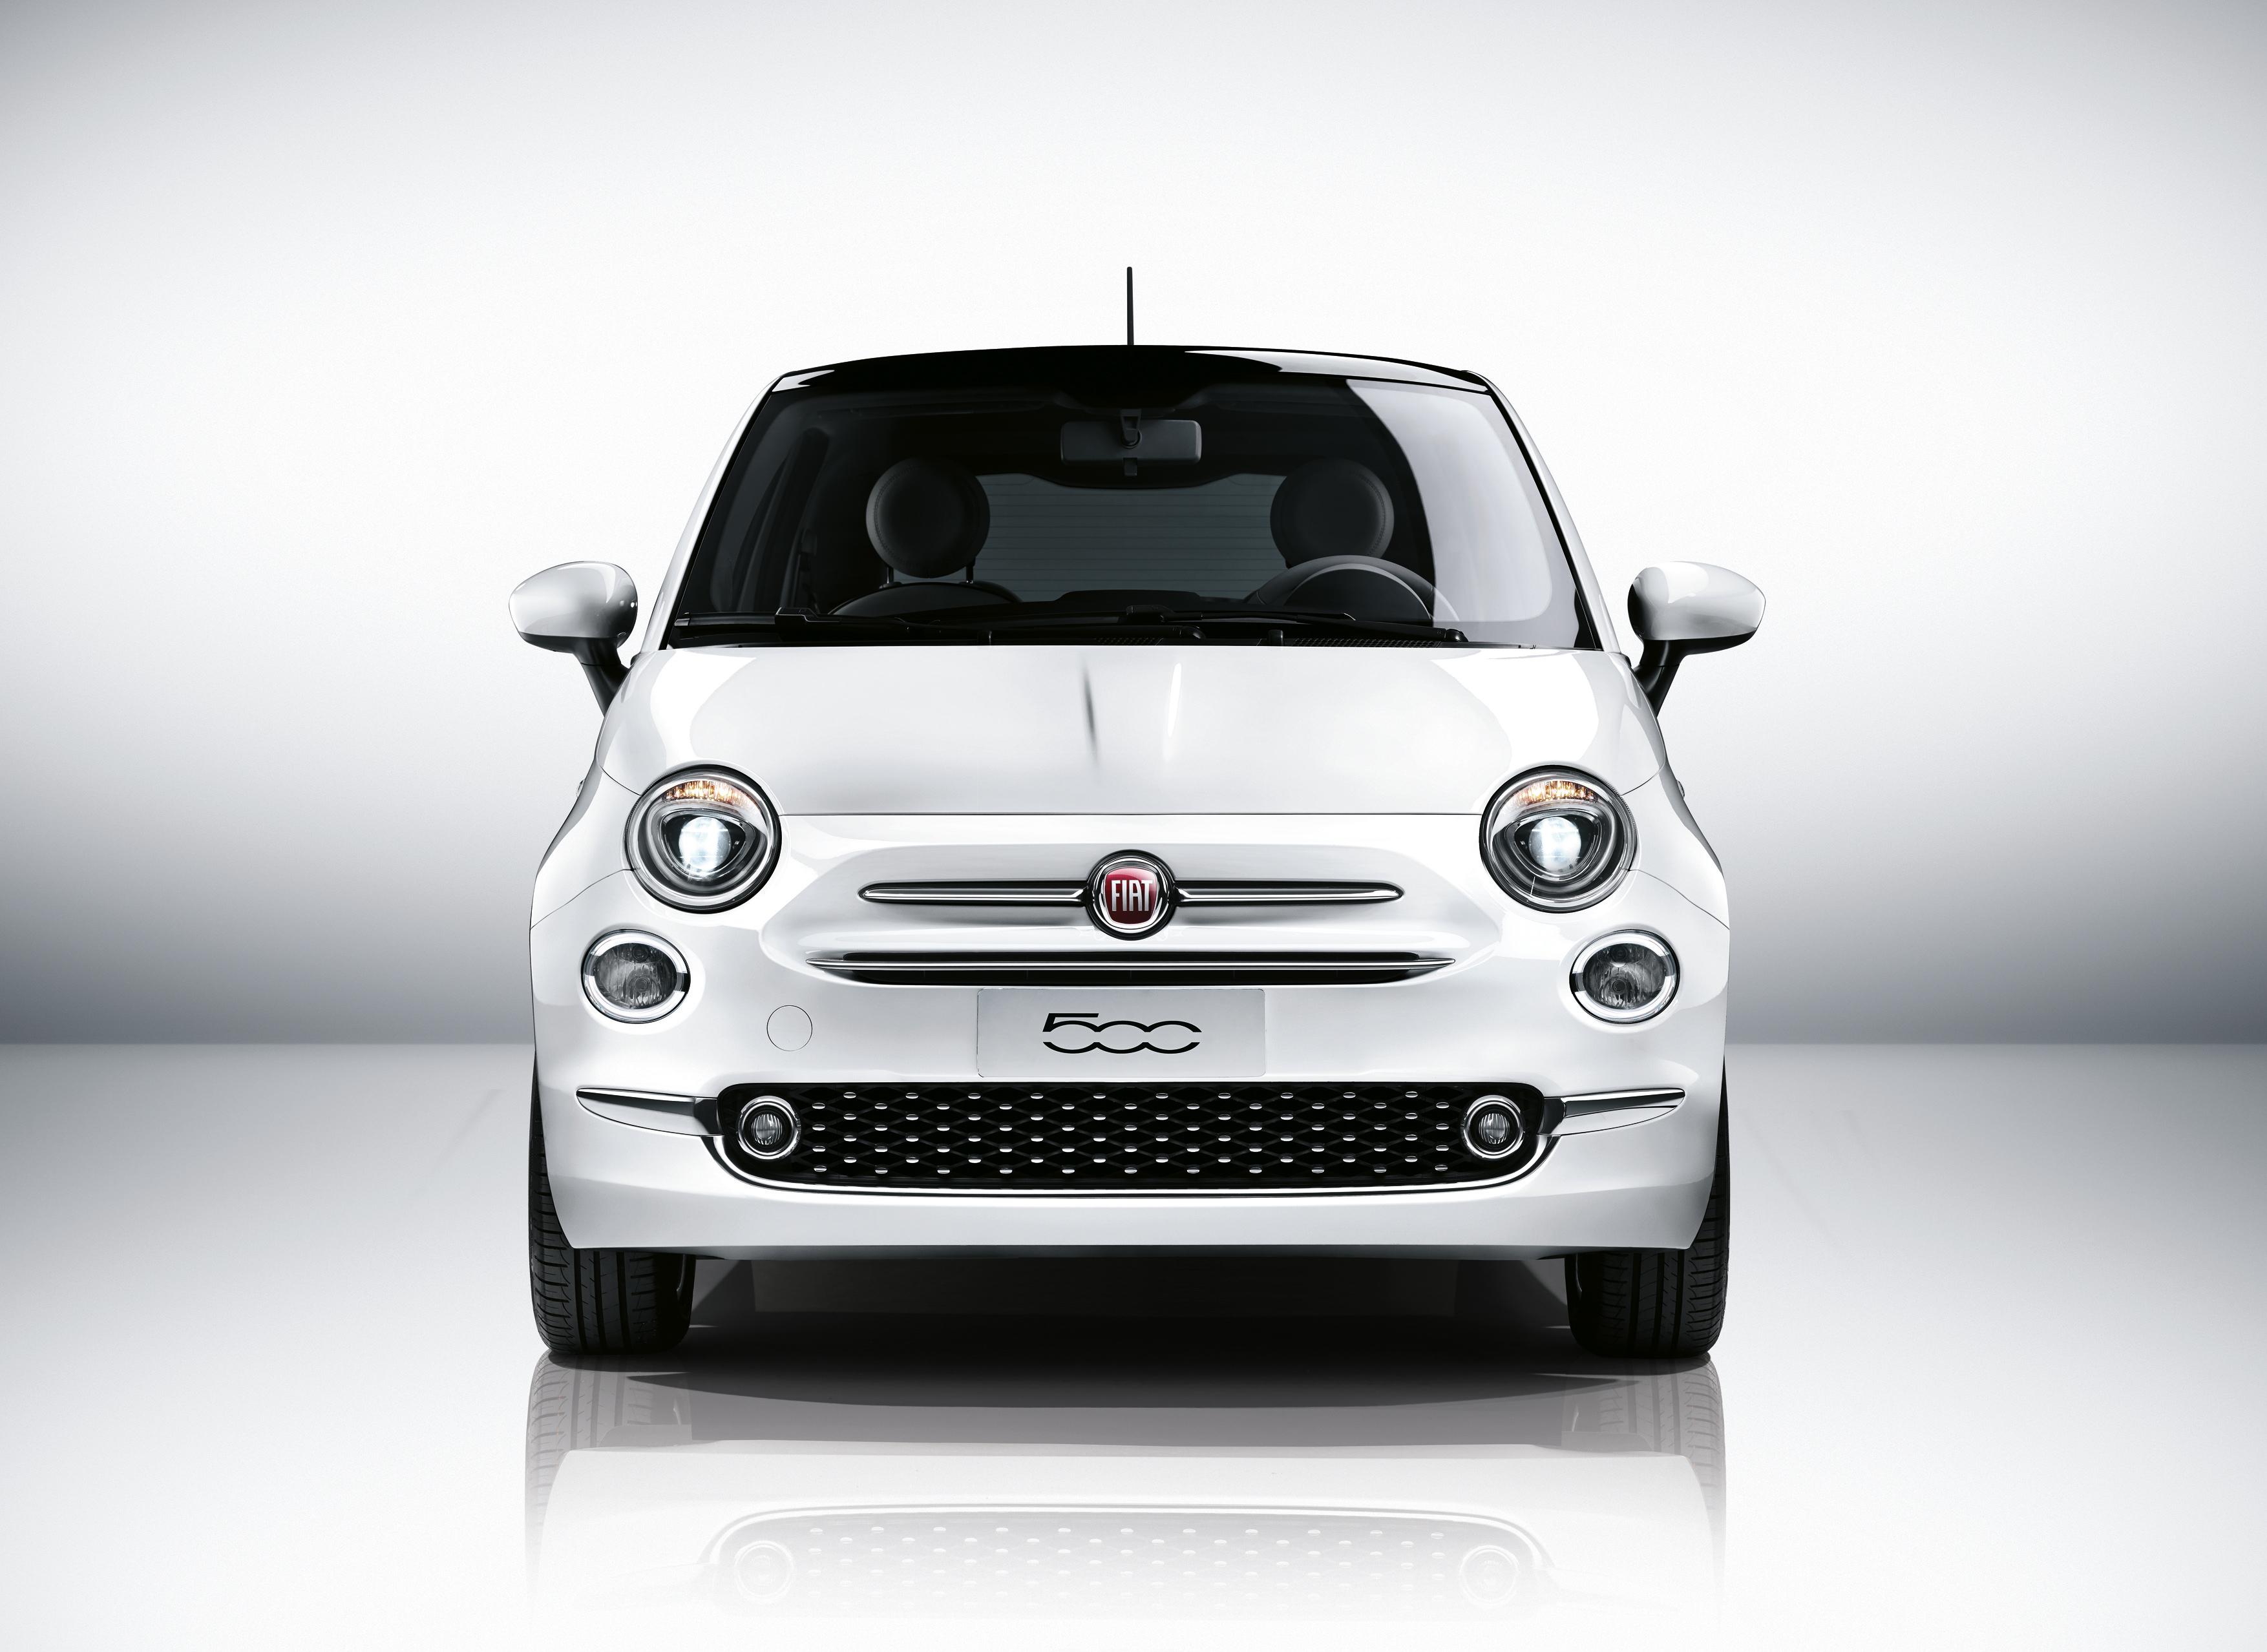 Fiat 500 - Nuova 500 - 2016 - face avant / front